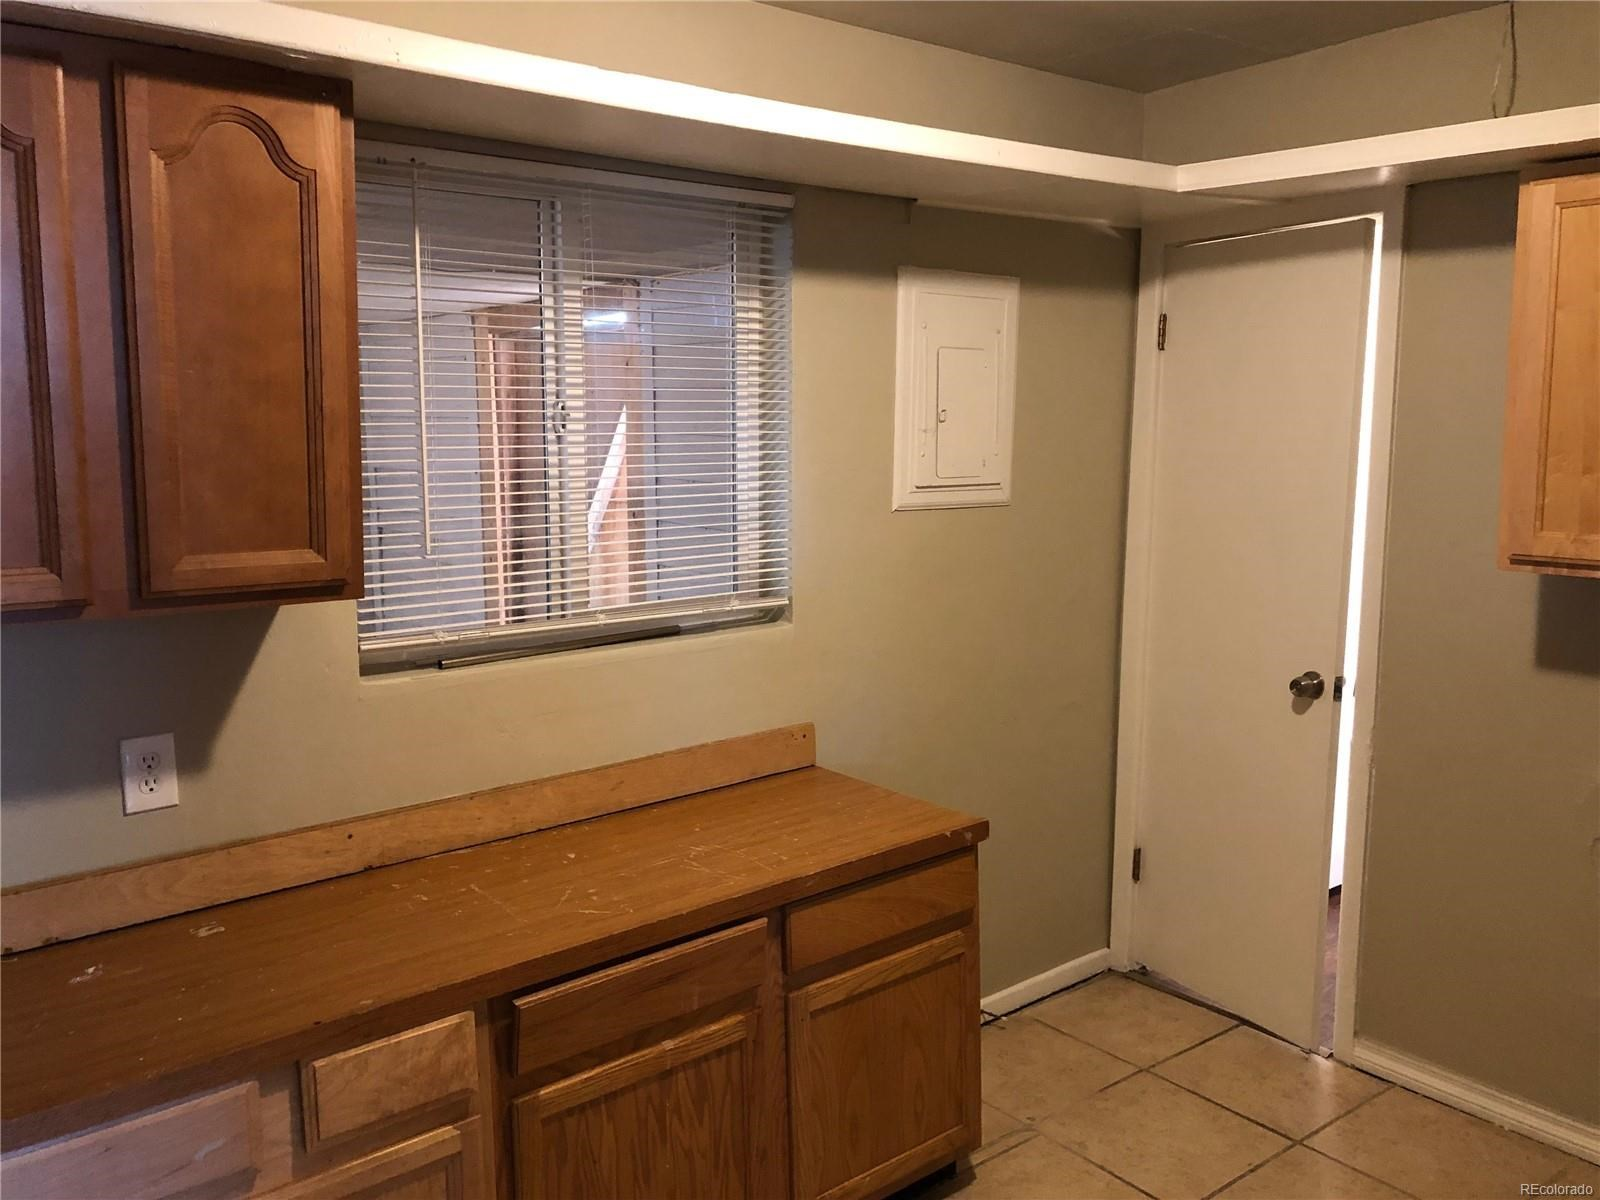 MLS# 6216904 - 8 - 9270 Myrna Place, Thornton, CO 80229